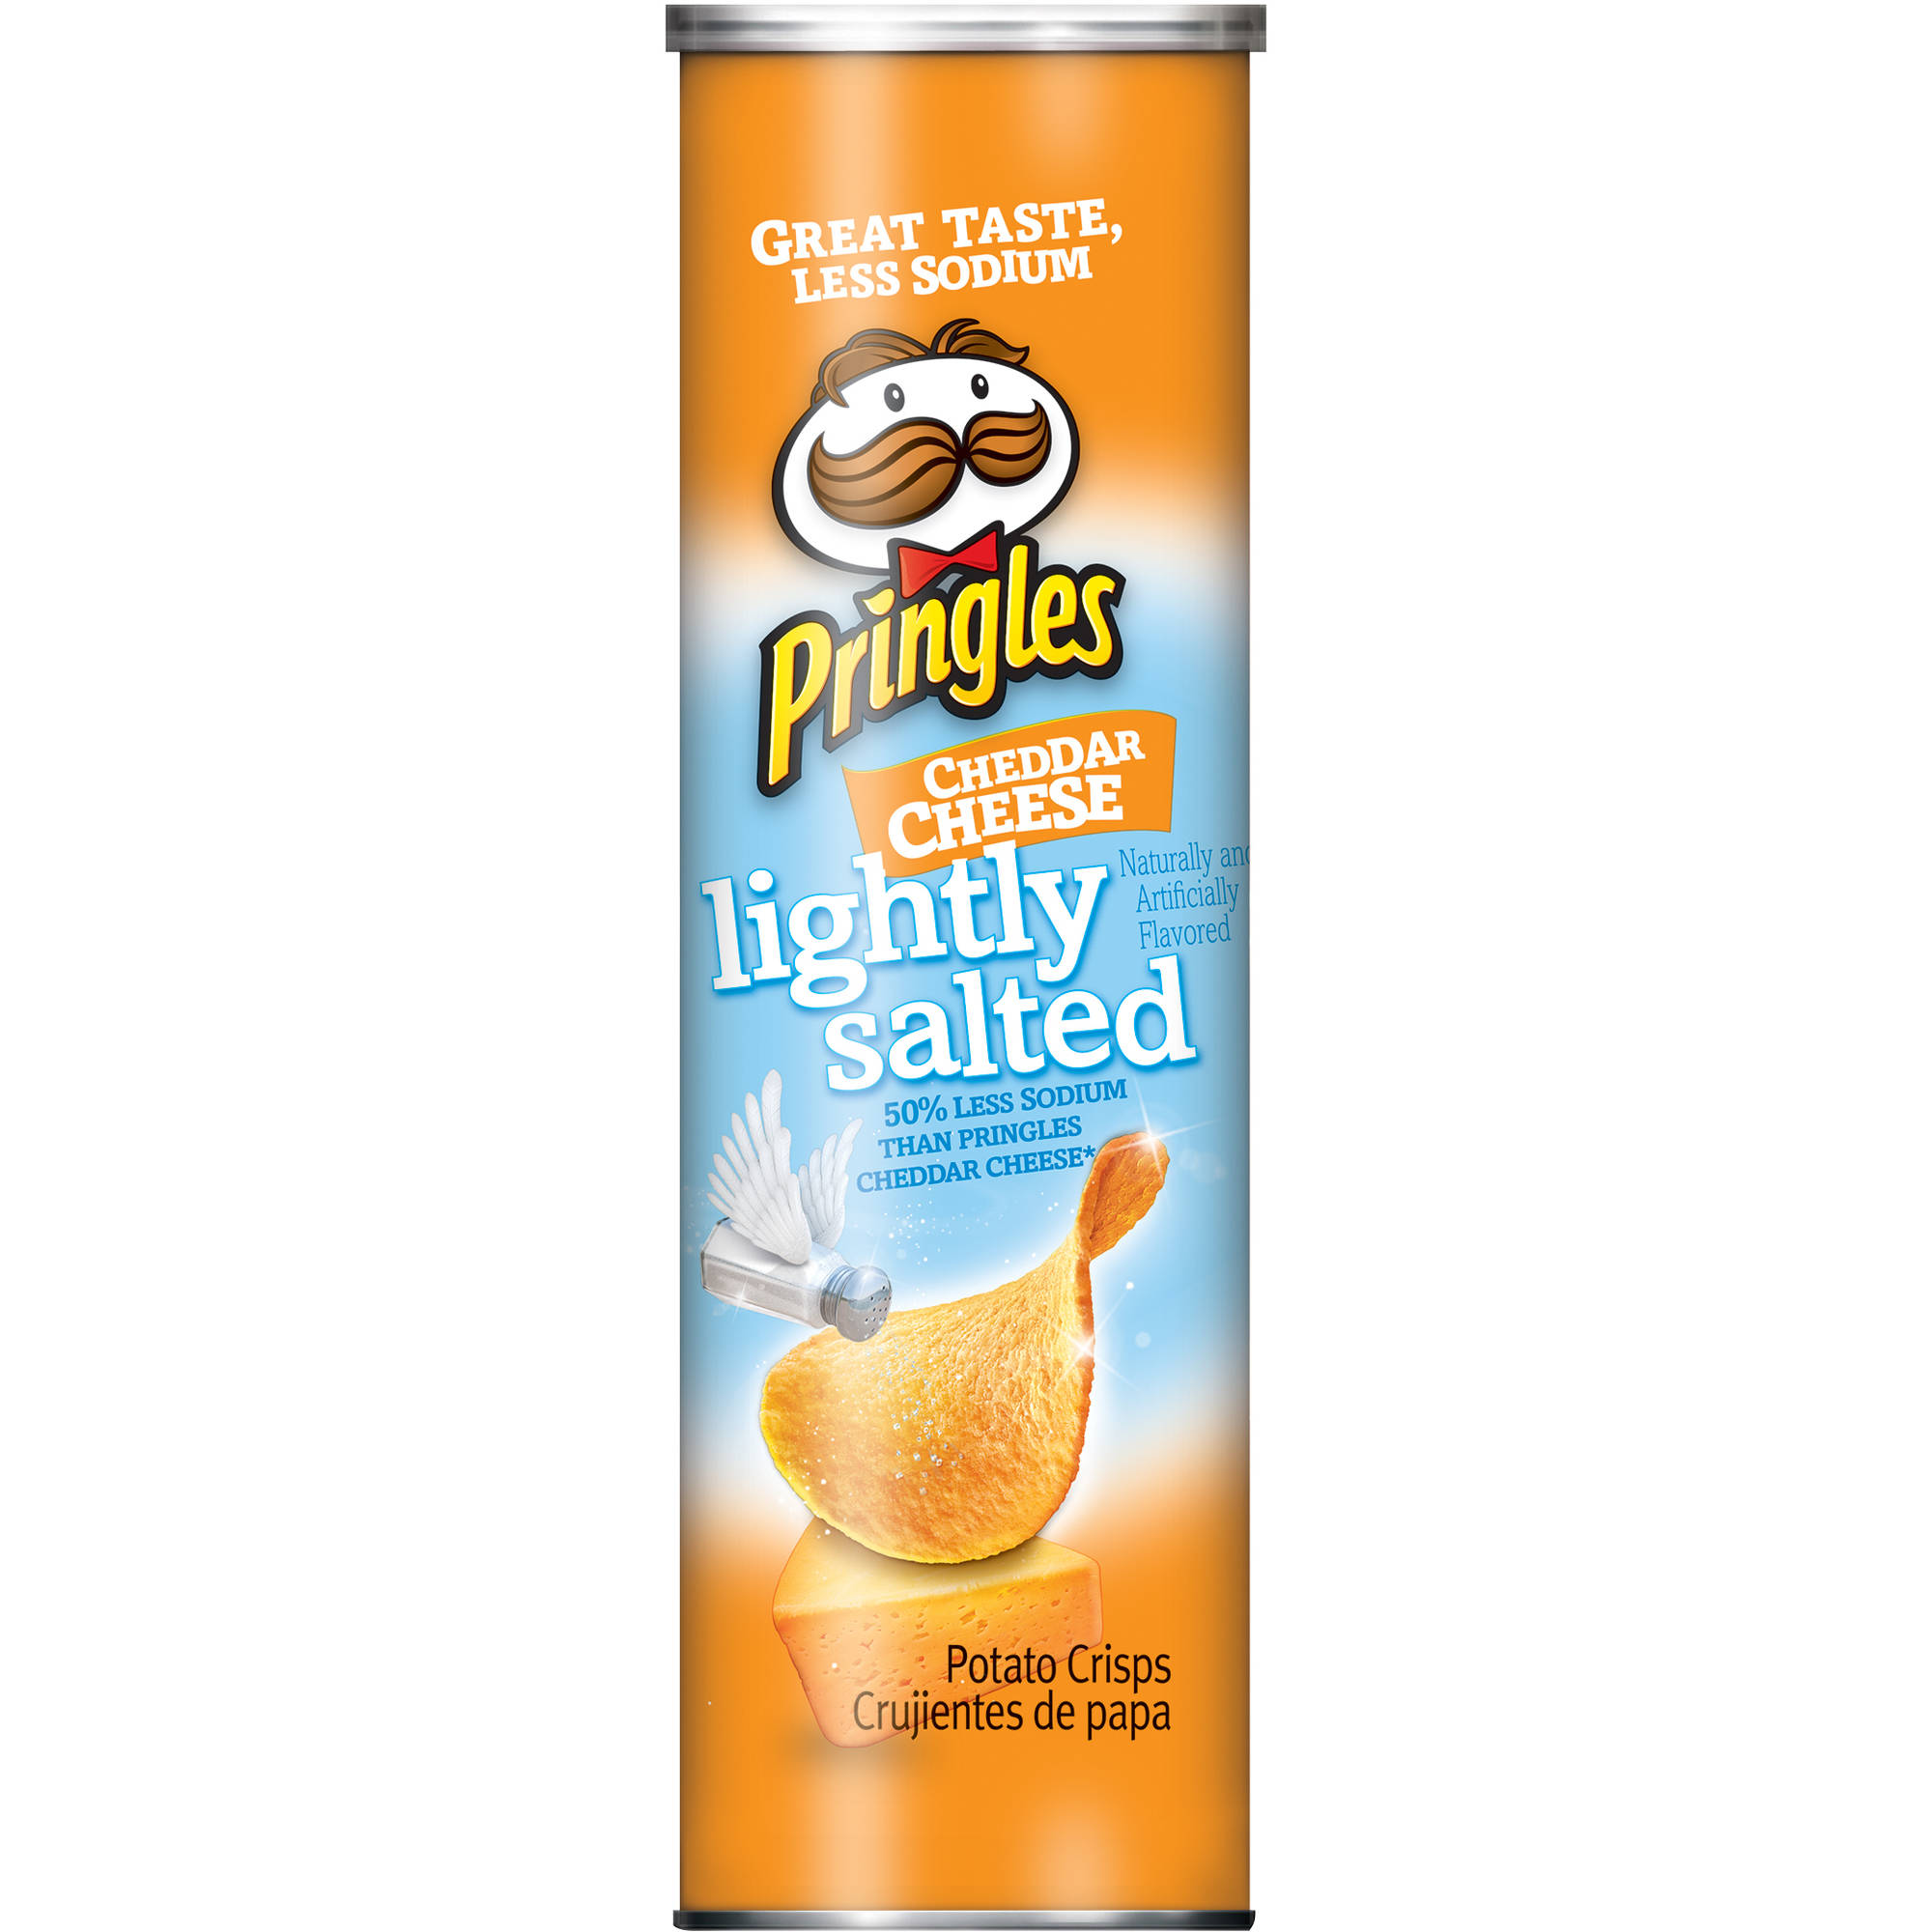 ip Pringles Lightly Salted Cheddar Cheese Potato Crisps  oz